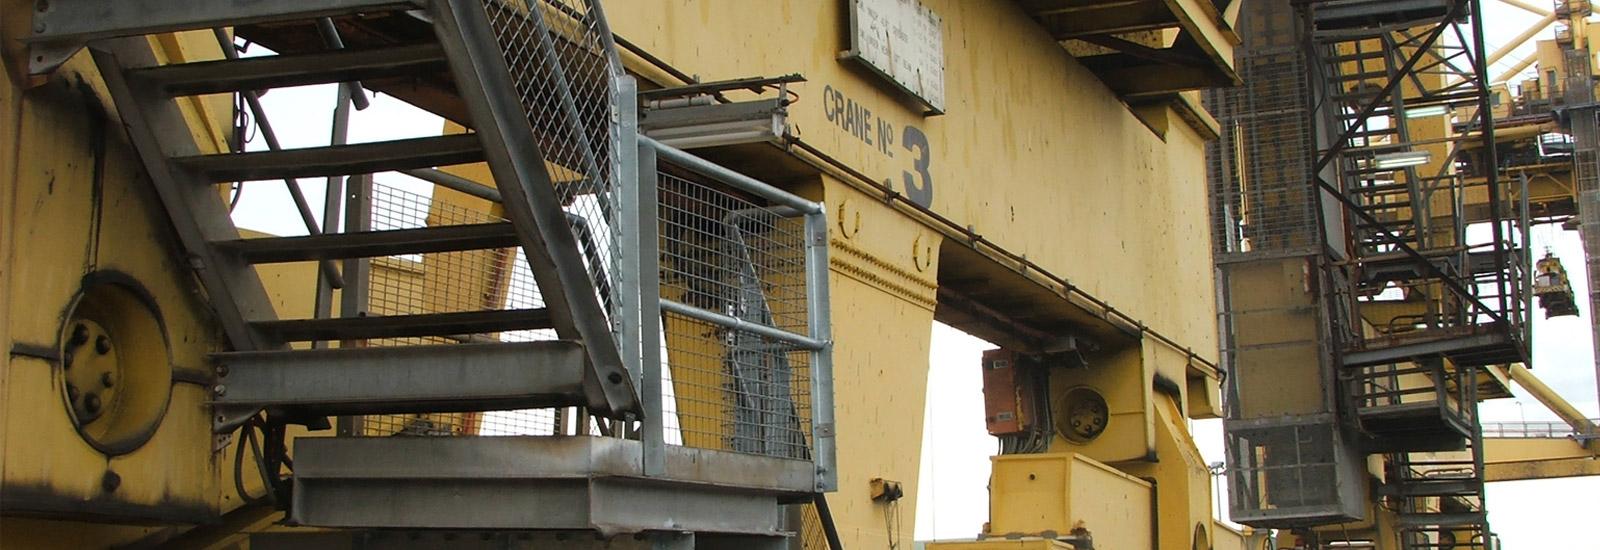 Container Crane Maintenance